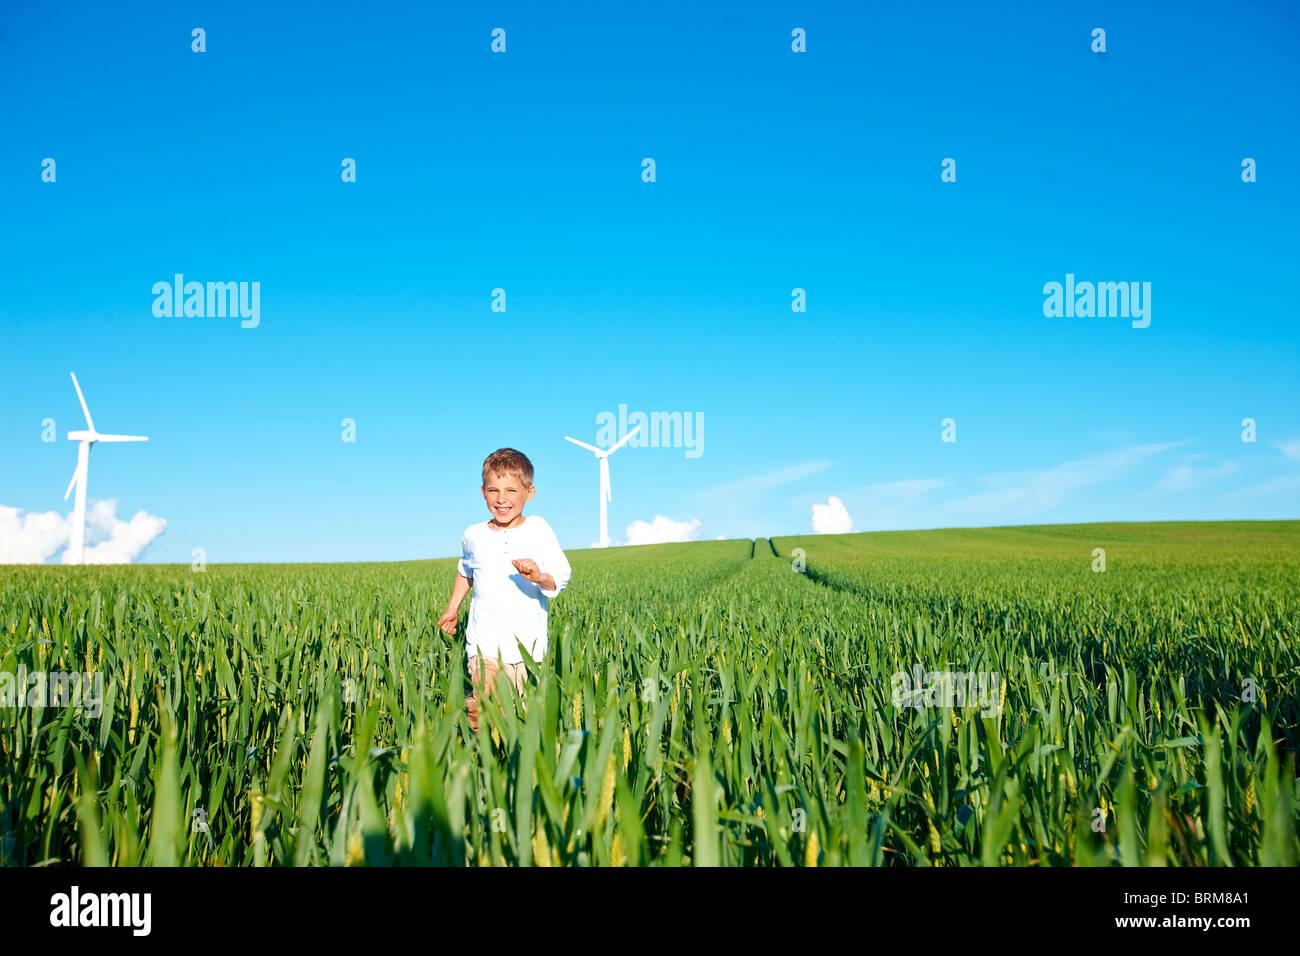 Junge läuft auf Feld mit Windrädern Stockbild